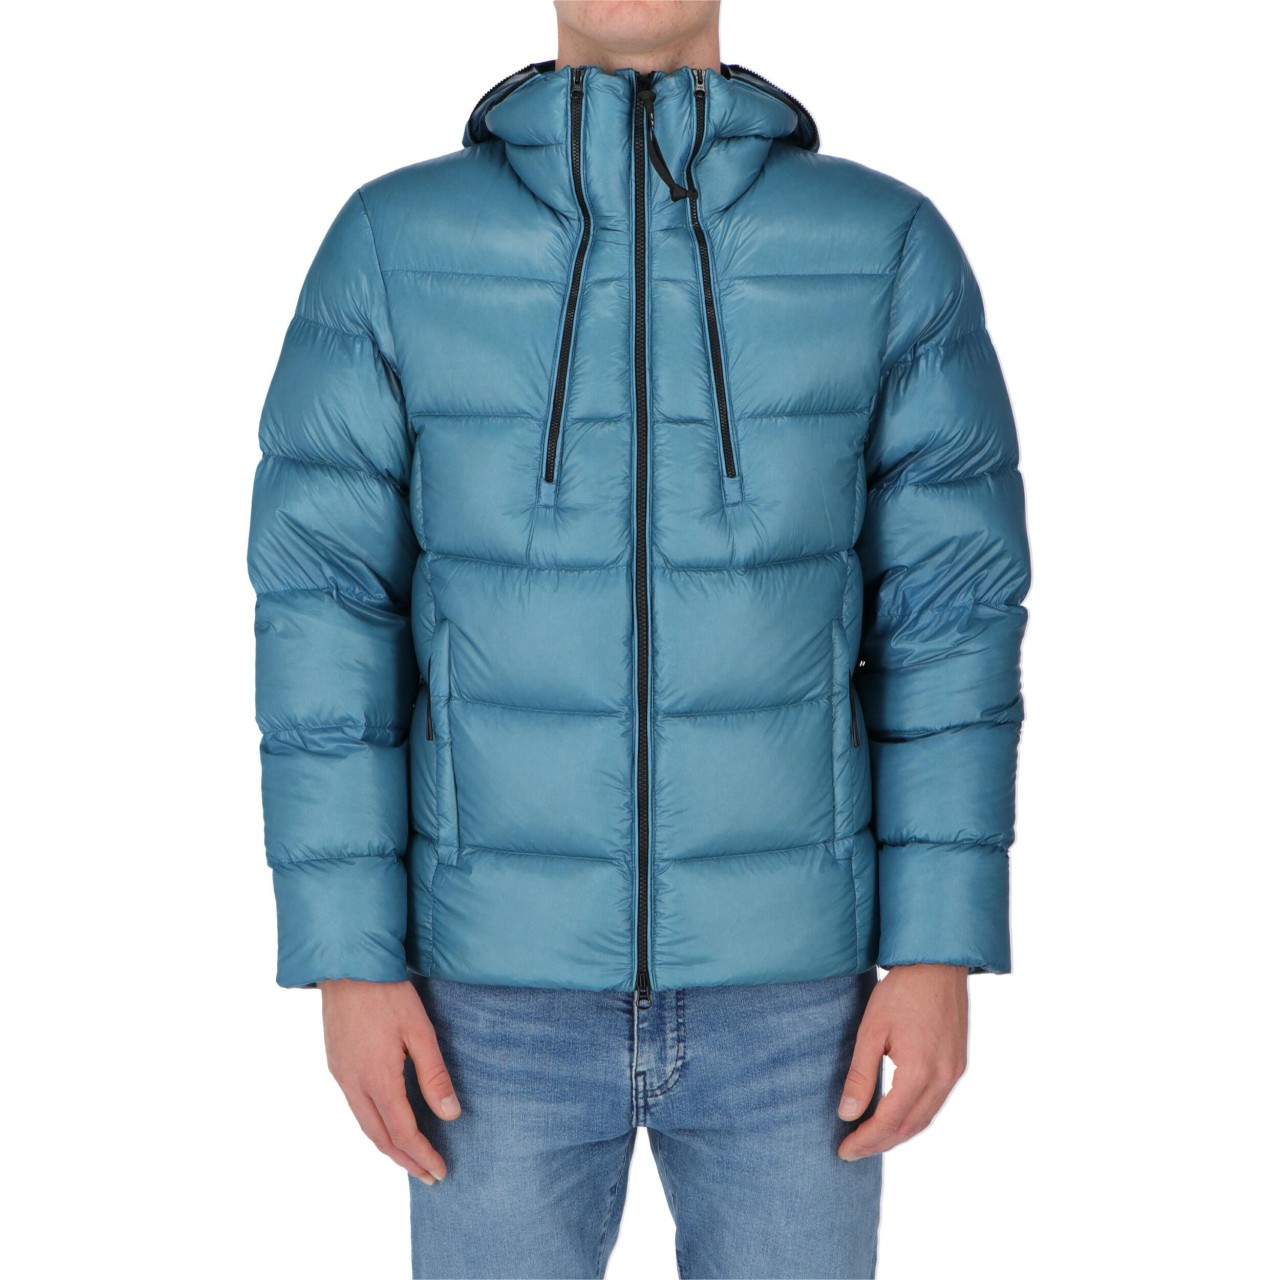 C.p. company Giacca C.p. Company Piuma Outwear Medium Jacket 206AM